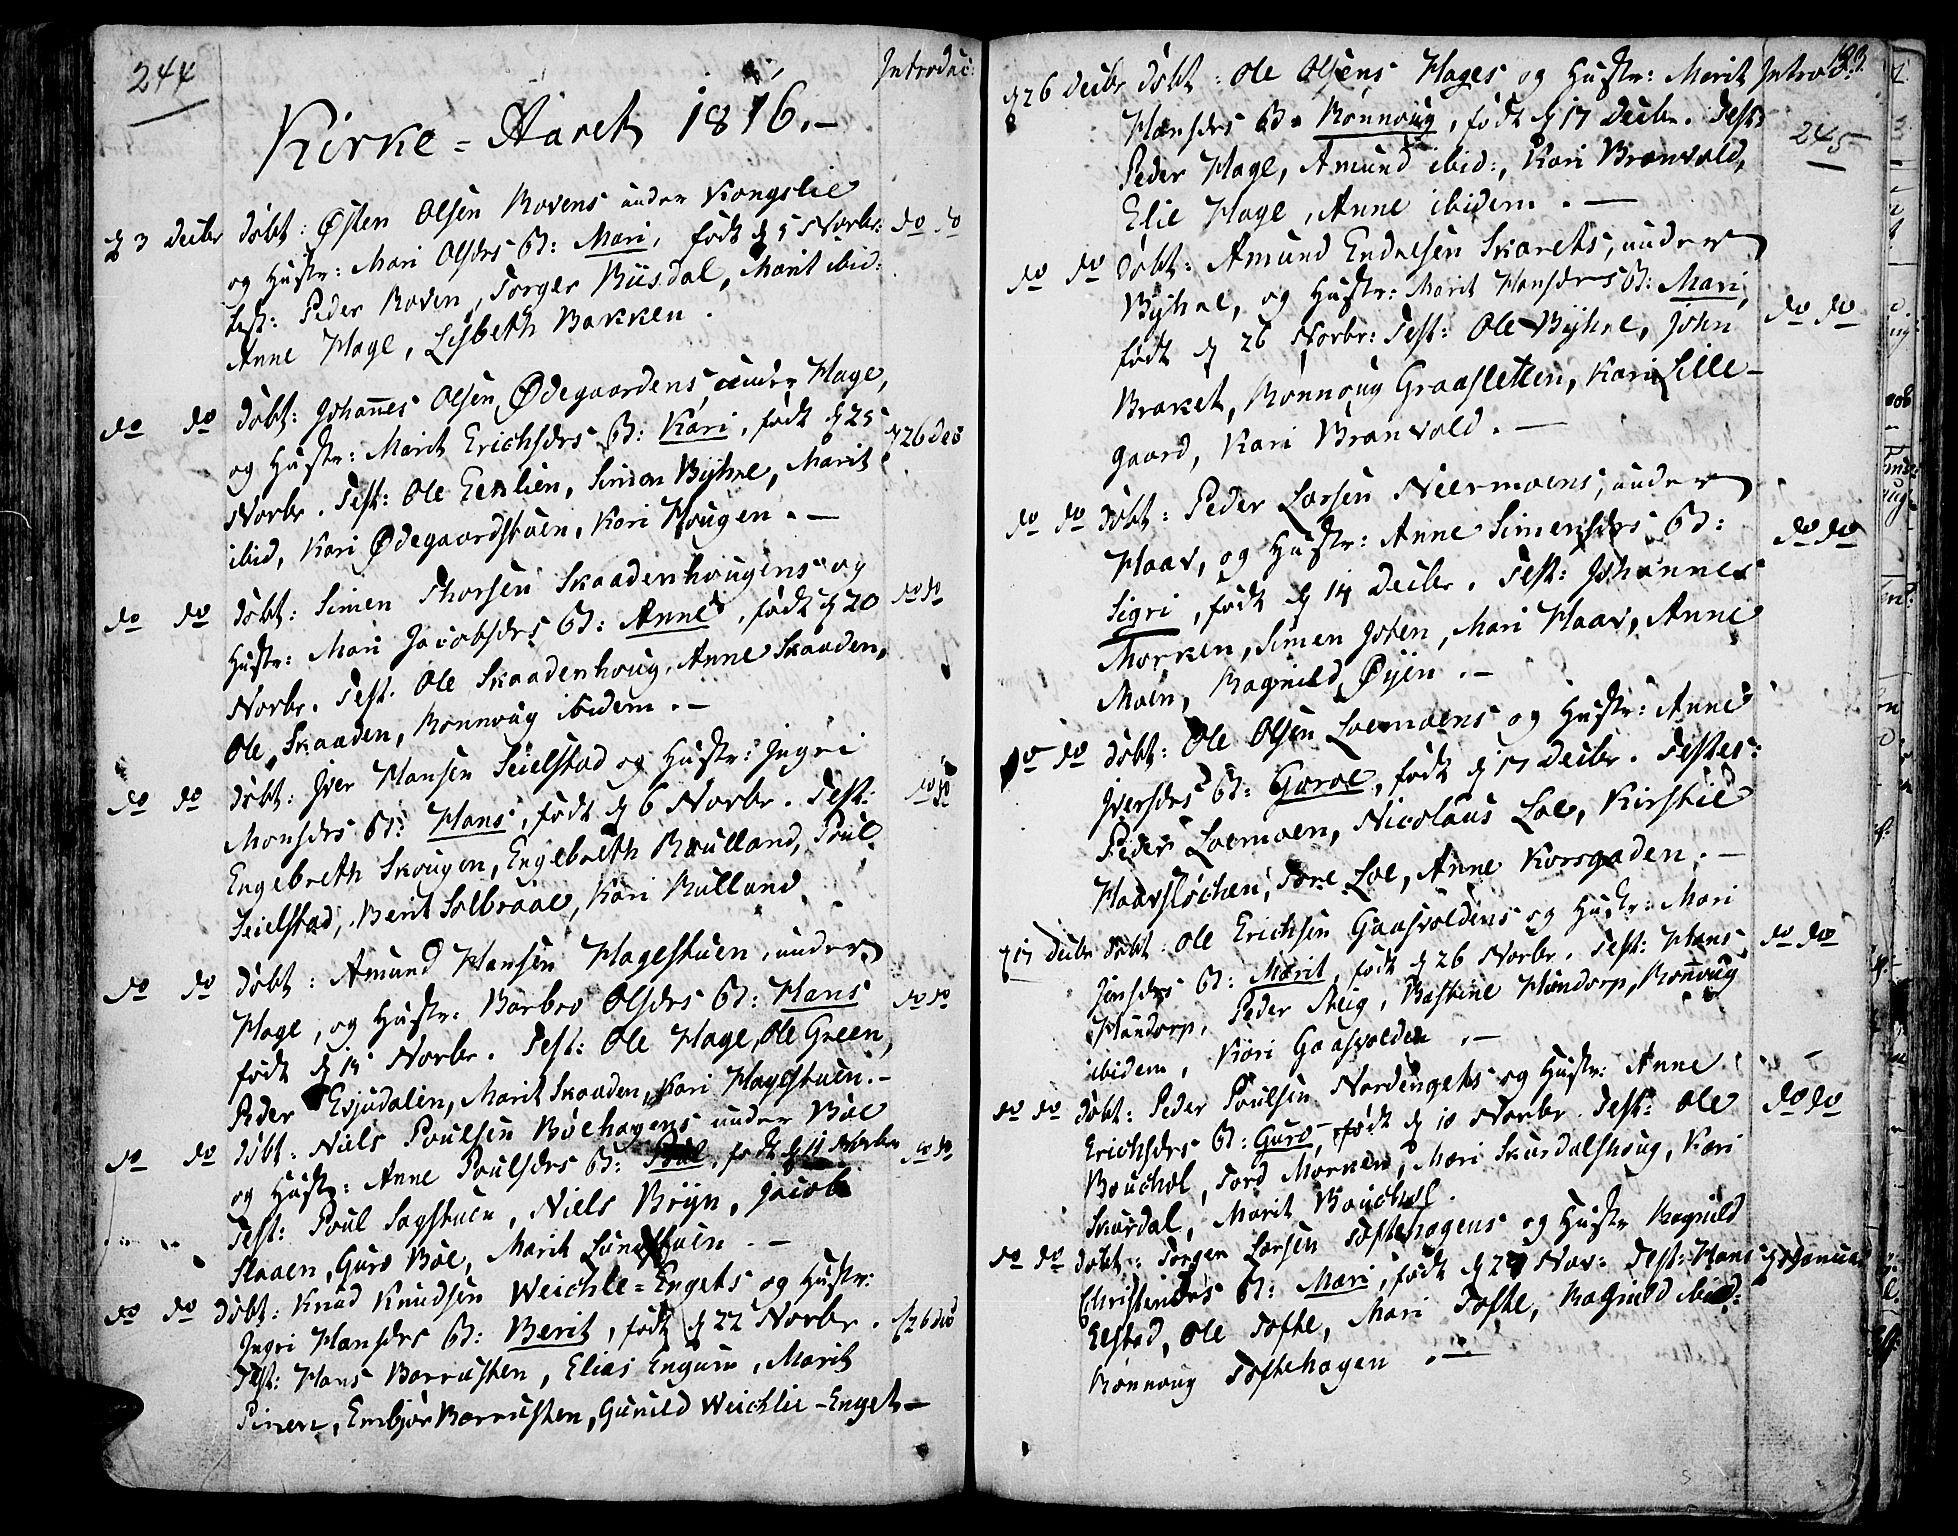 SAH, Fron prestekontor, H/Ha/Haa/L0001: Ministerialbok nr. 1, 1799-1816, s. 244-245